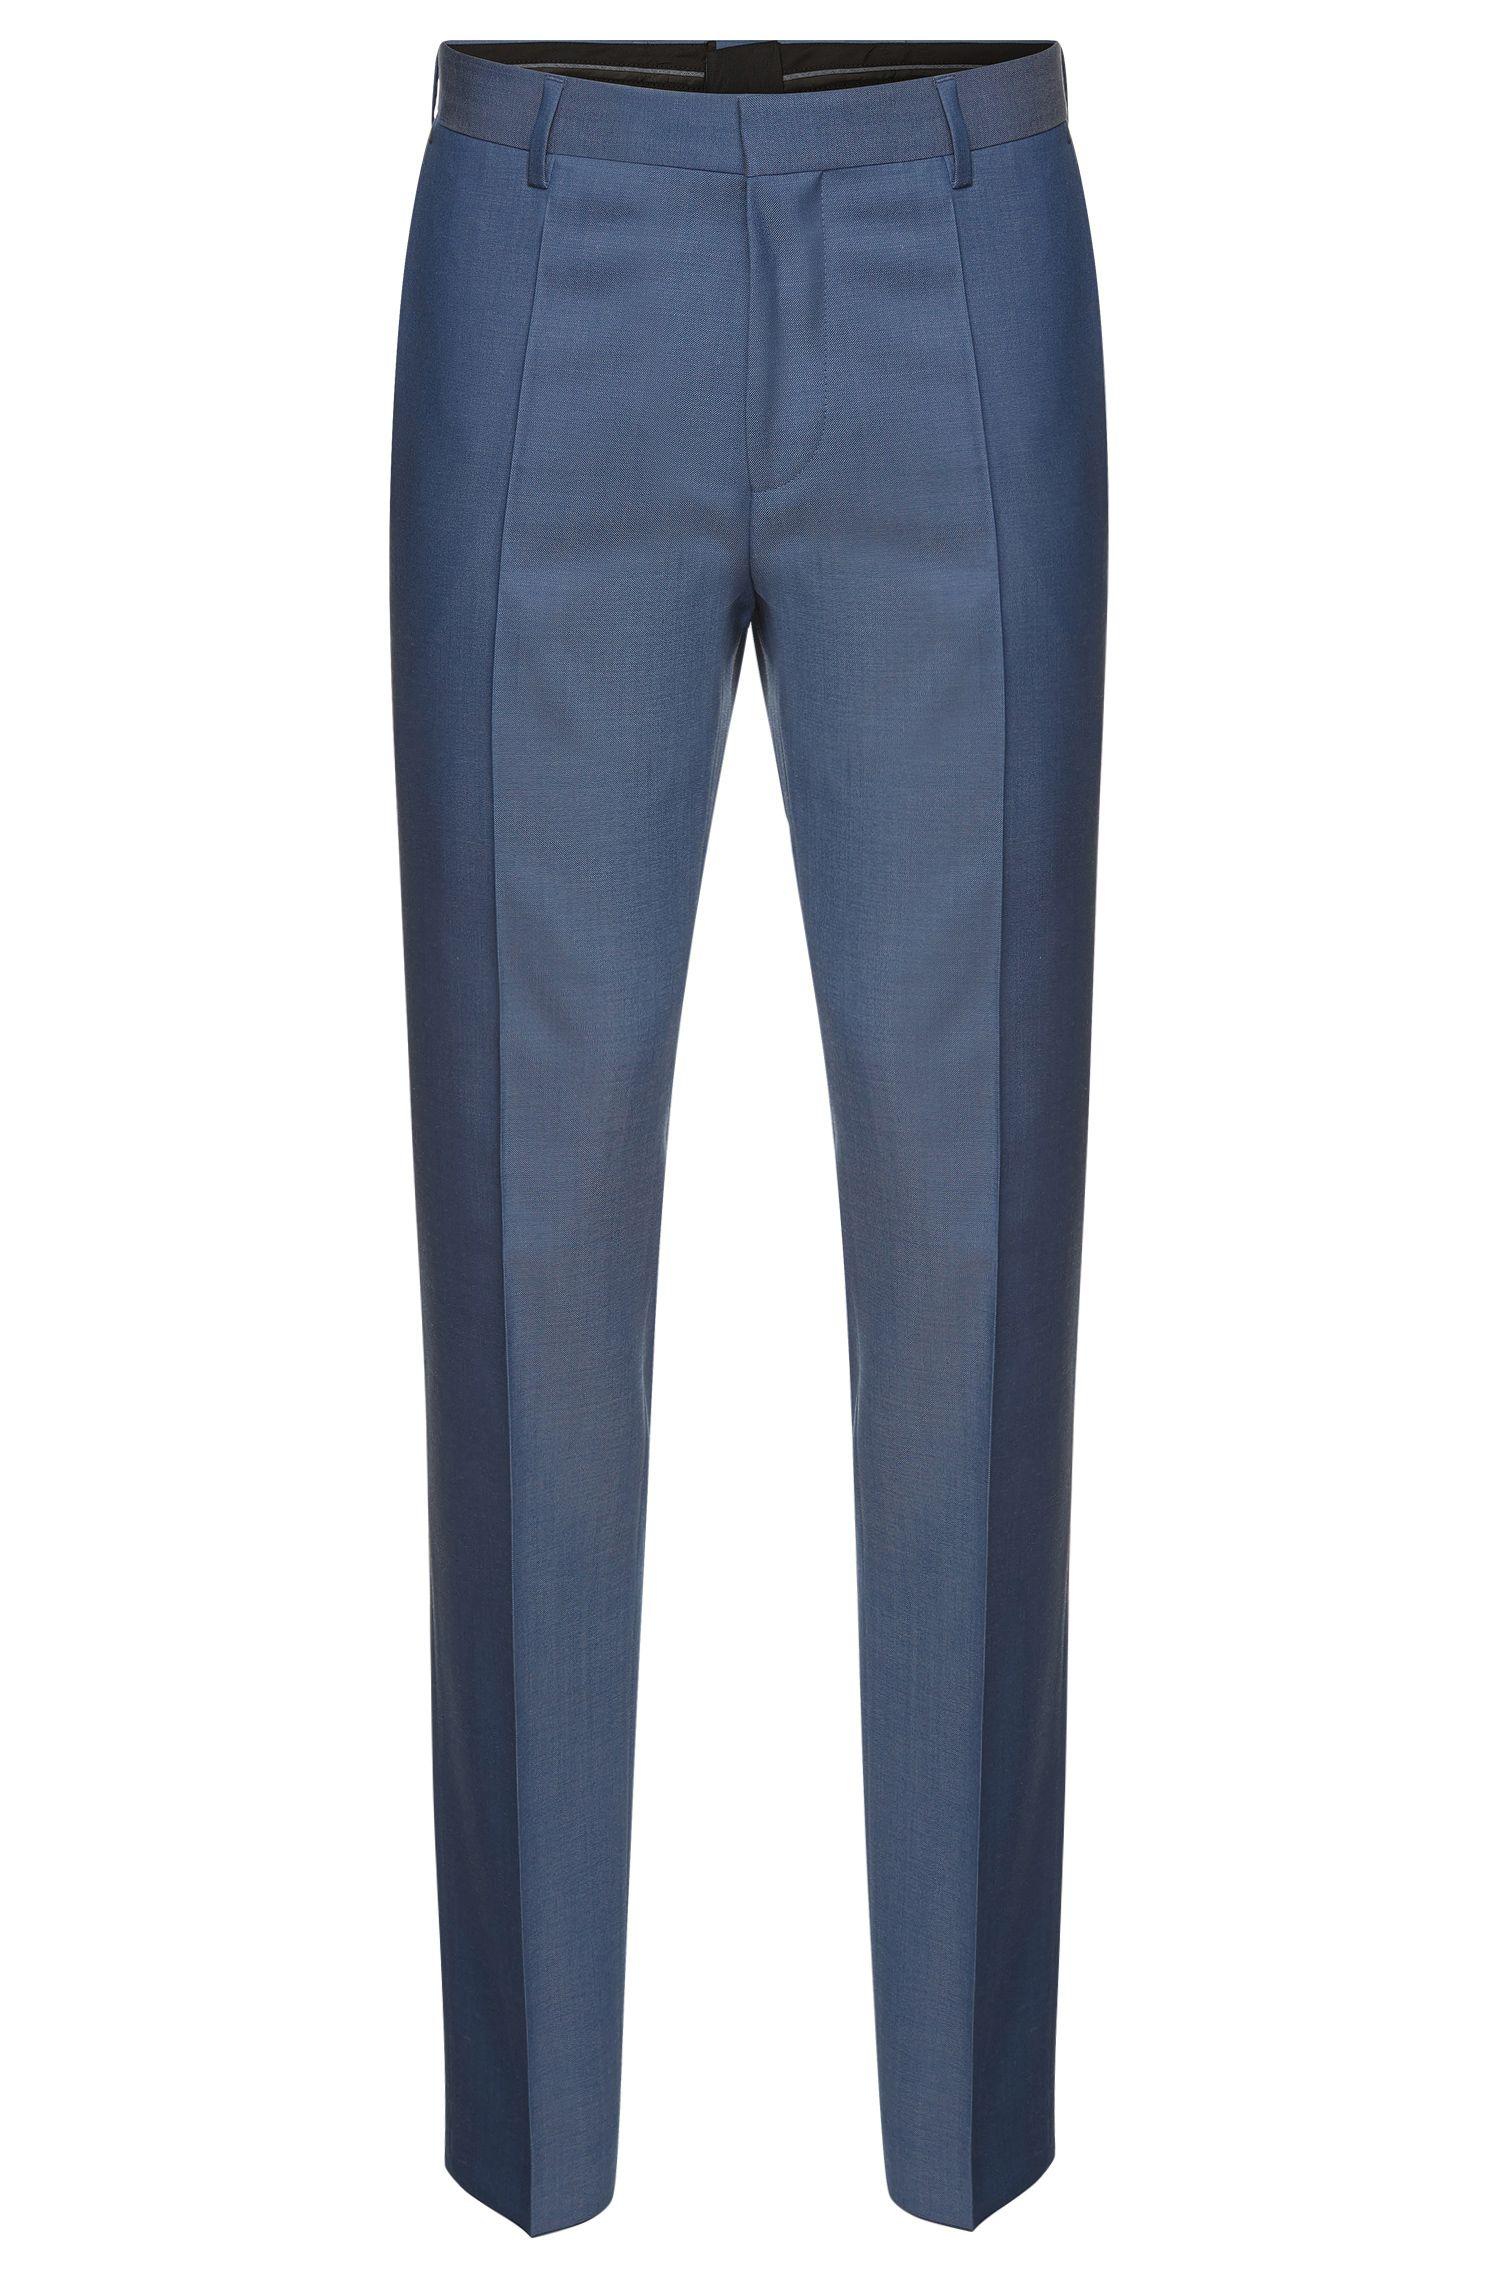 'Genesis'   Slim Fit, Italian Super 100 Virgin Wool Dress Pants